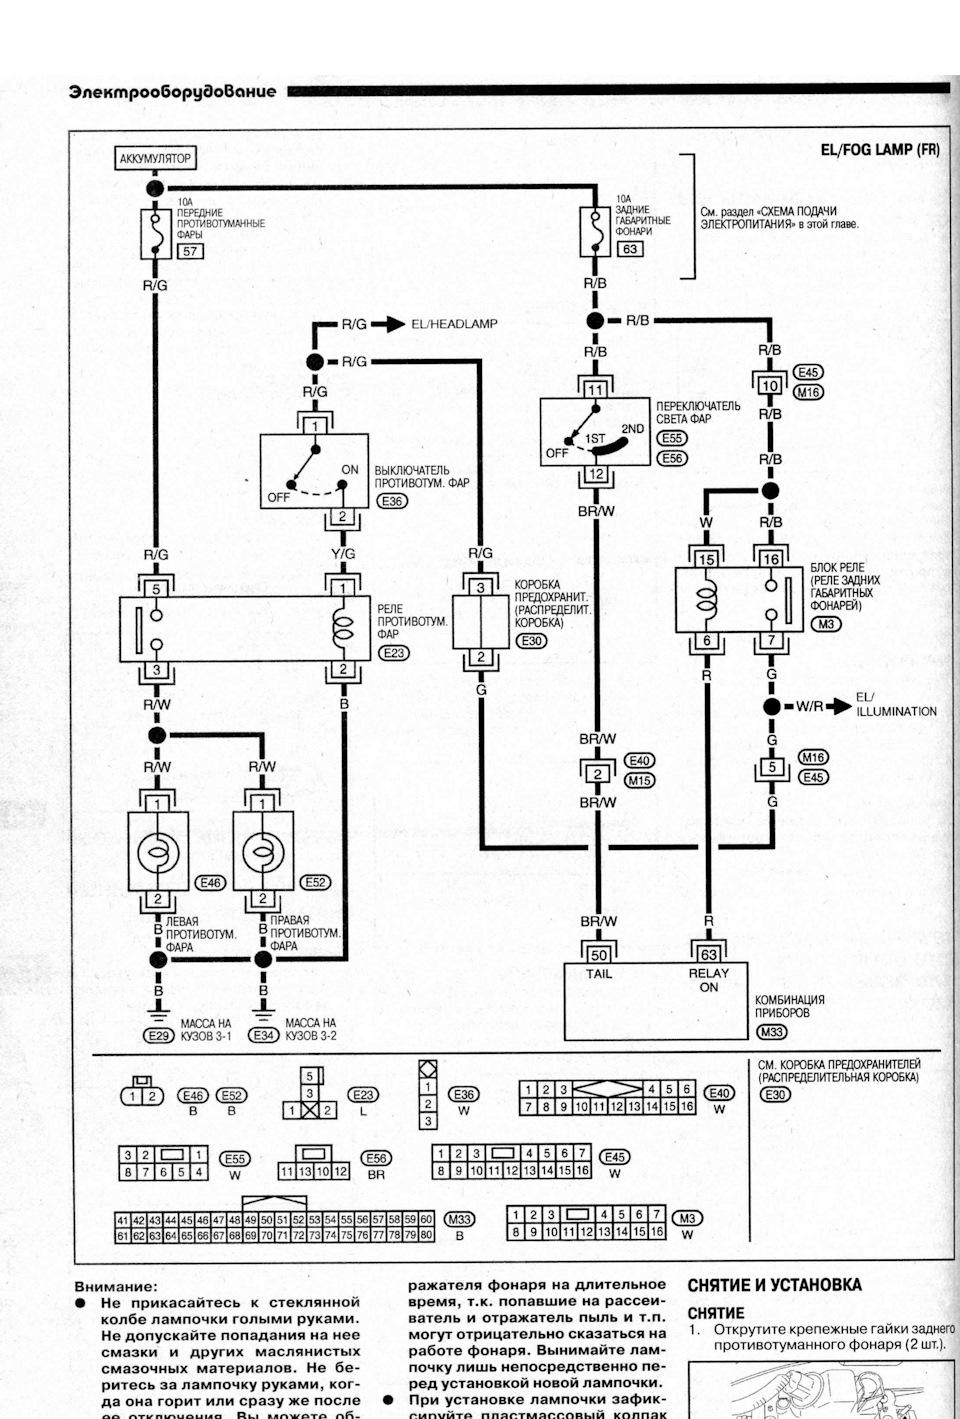 hight resolution of nissan n16 wiring diagram pdf wiring diagram wiring diagram for nissan pulsar n16 wiring diagram nissan